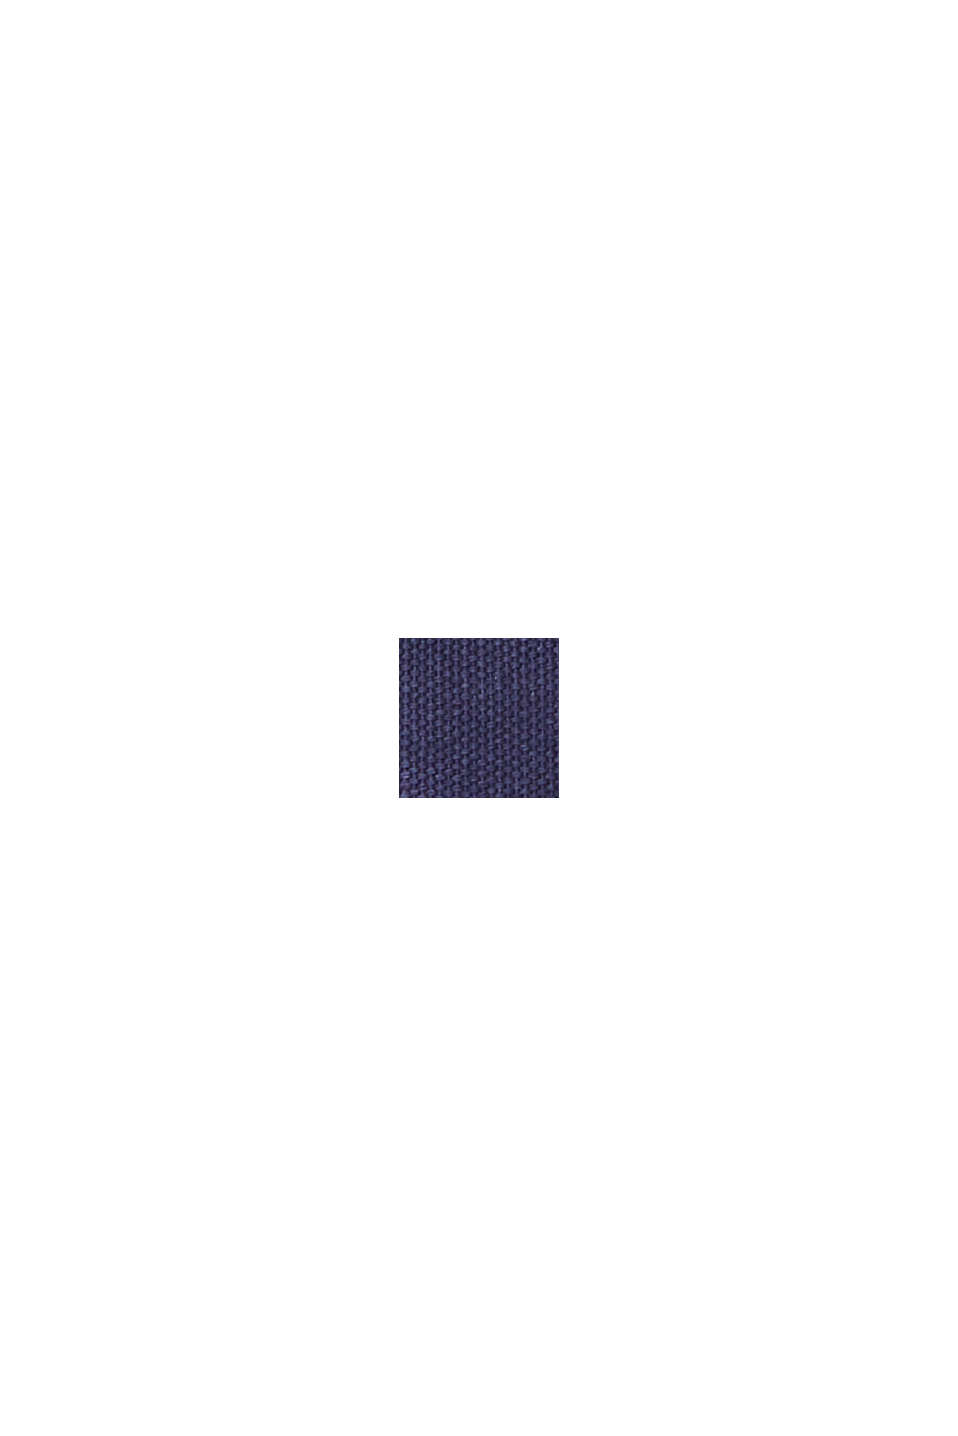 Sneakers di tela in similpelle, DARK BLUE, swatch